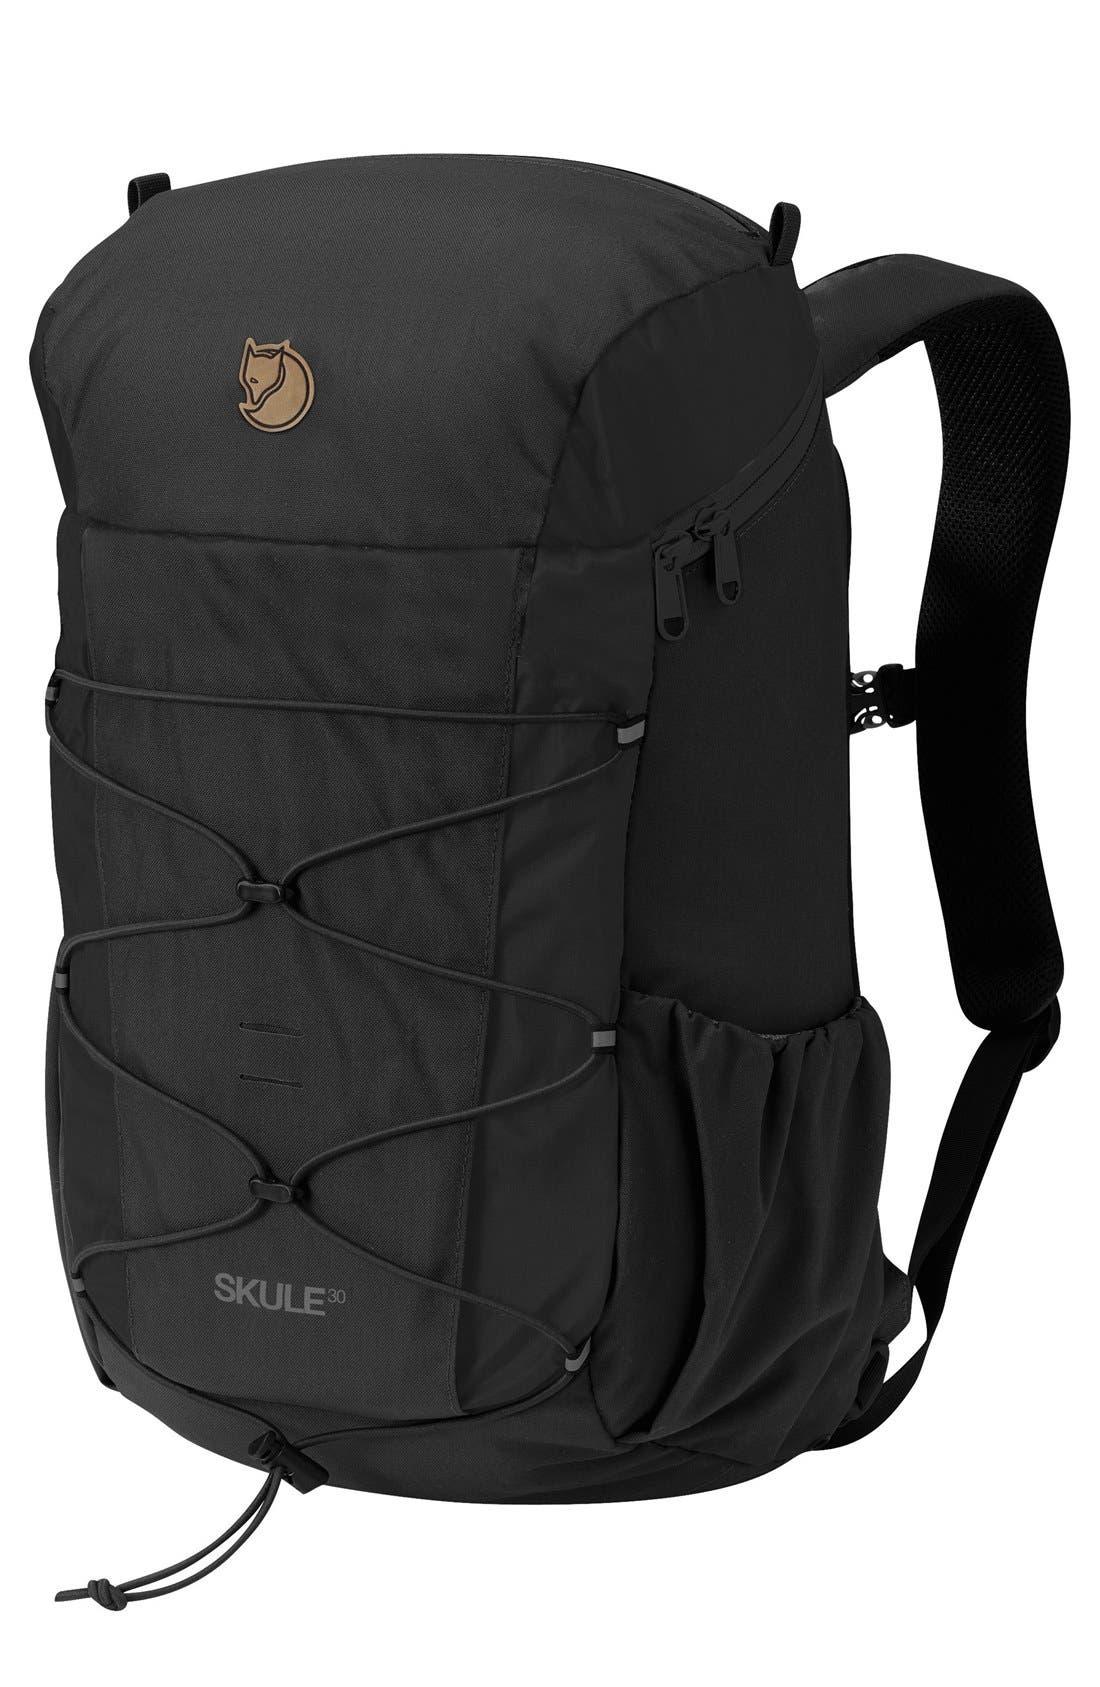 'Skule 30' Backpack, Main, color, 026